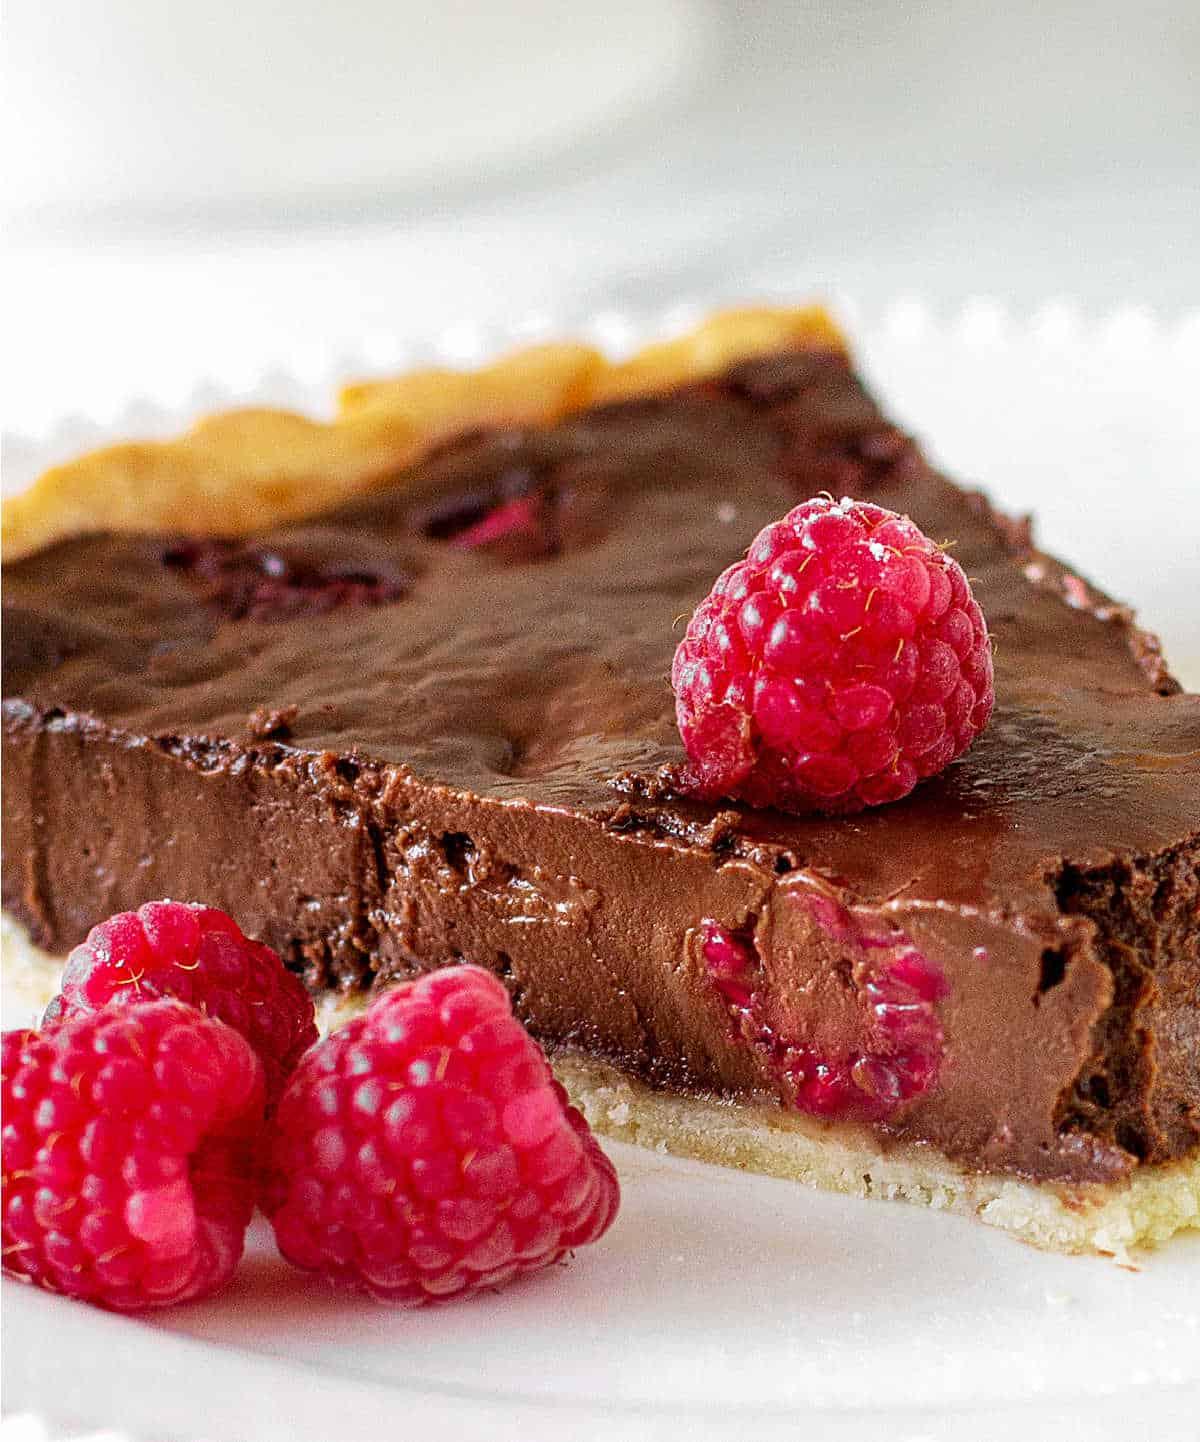 Close up slice of chocolate raspberry tart on white plate